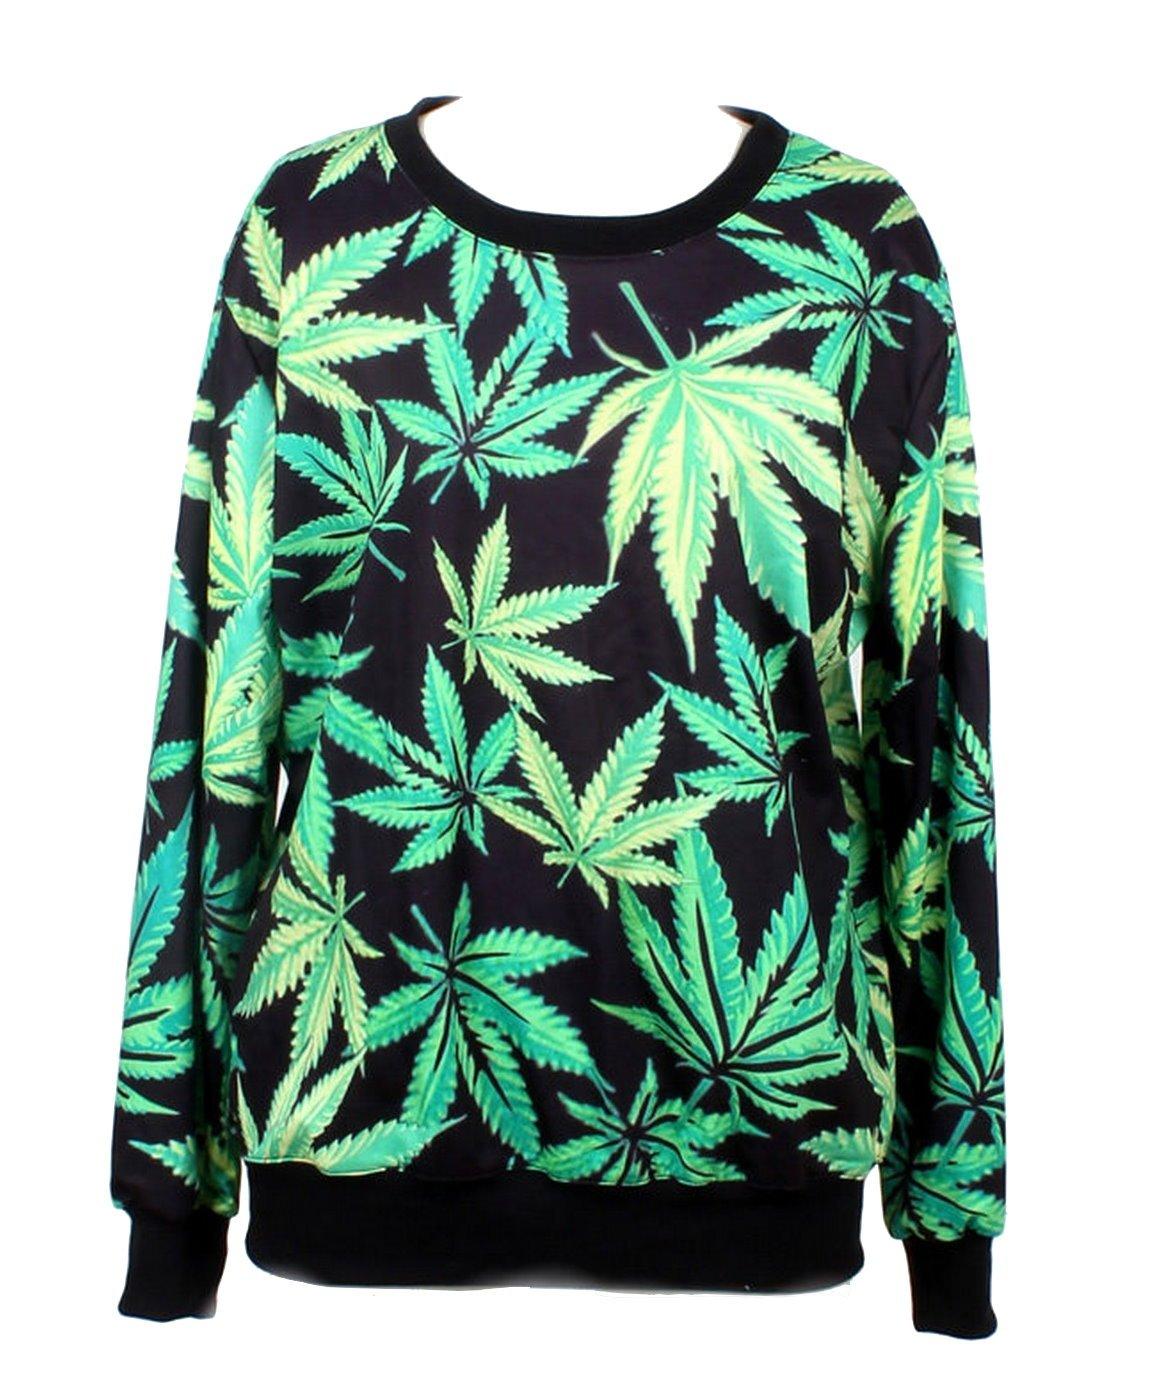 LoveLiness Fashion Sweatshirts Women's Neon Marijuana Leaf Print Sweatshirt